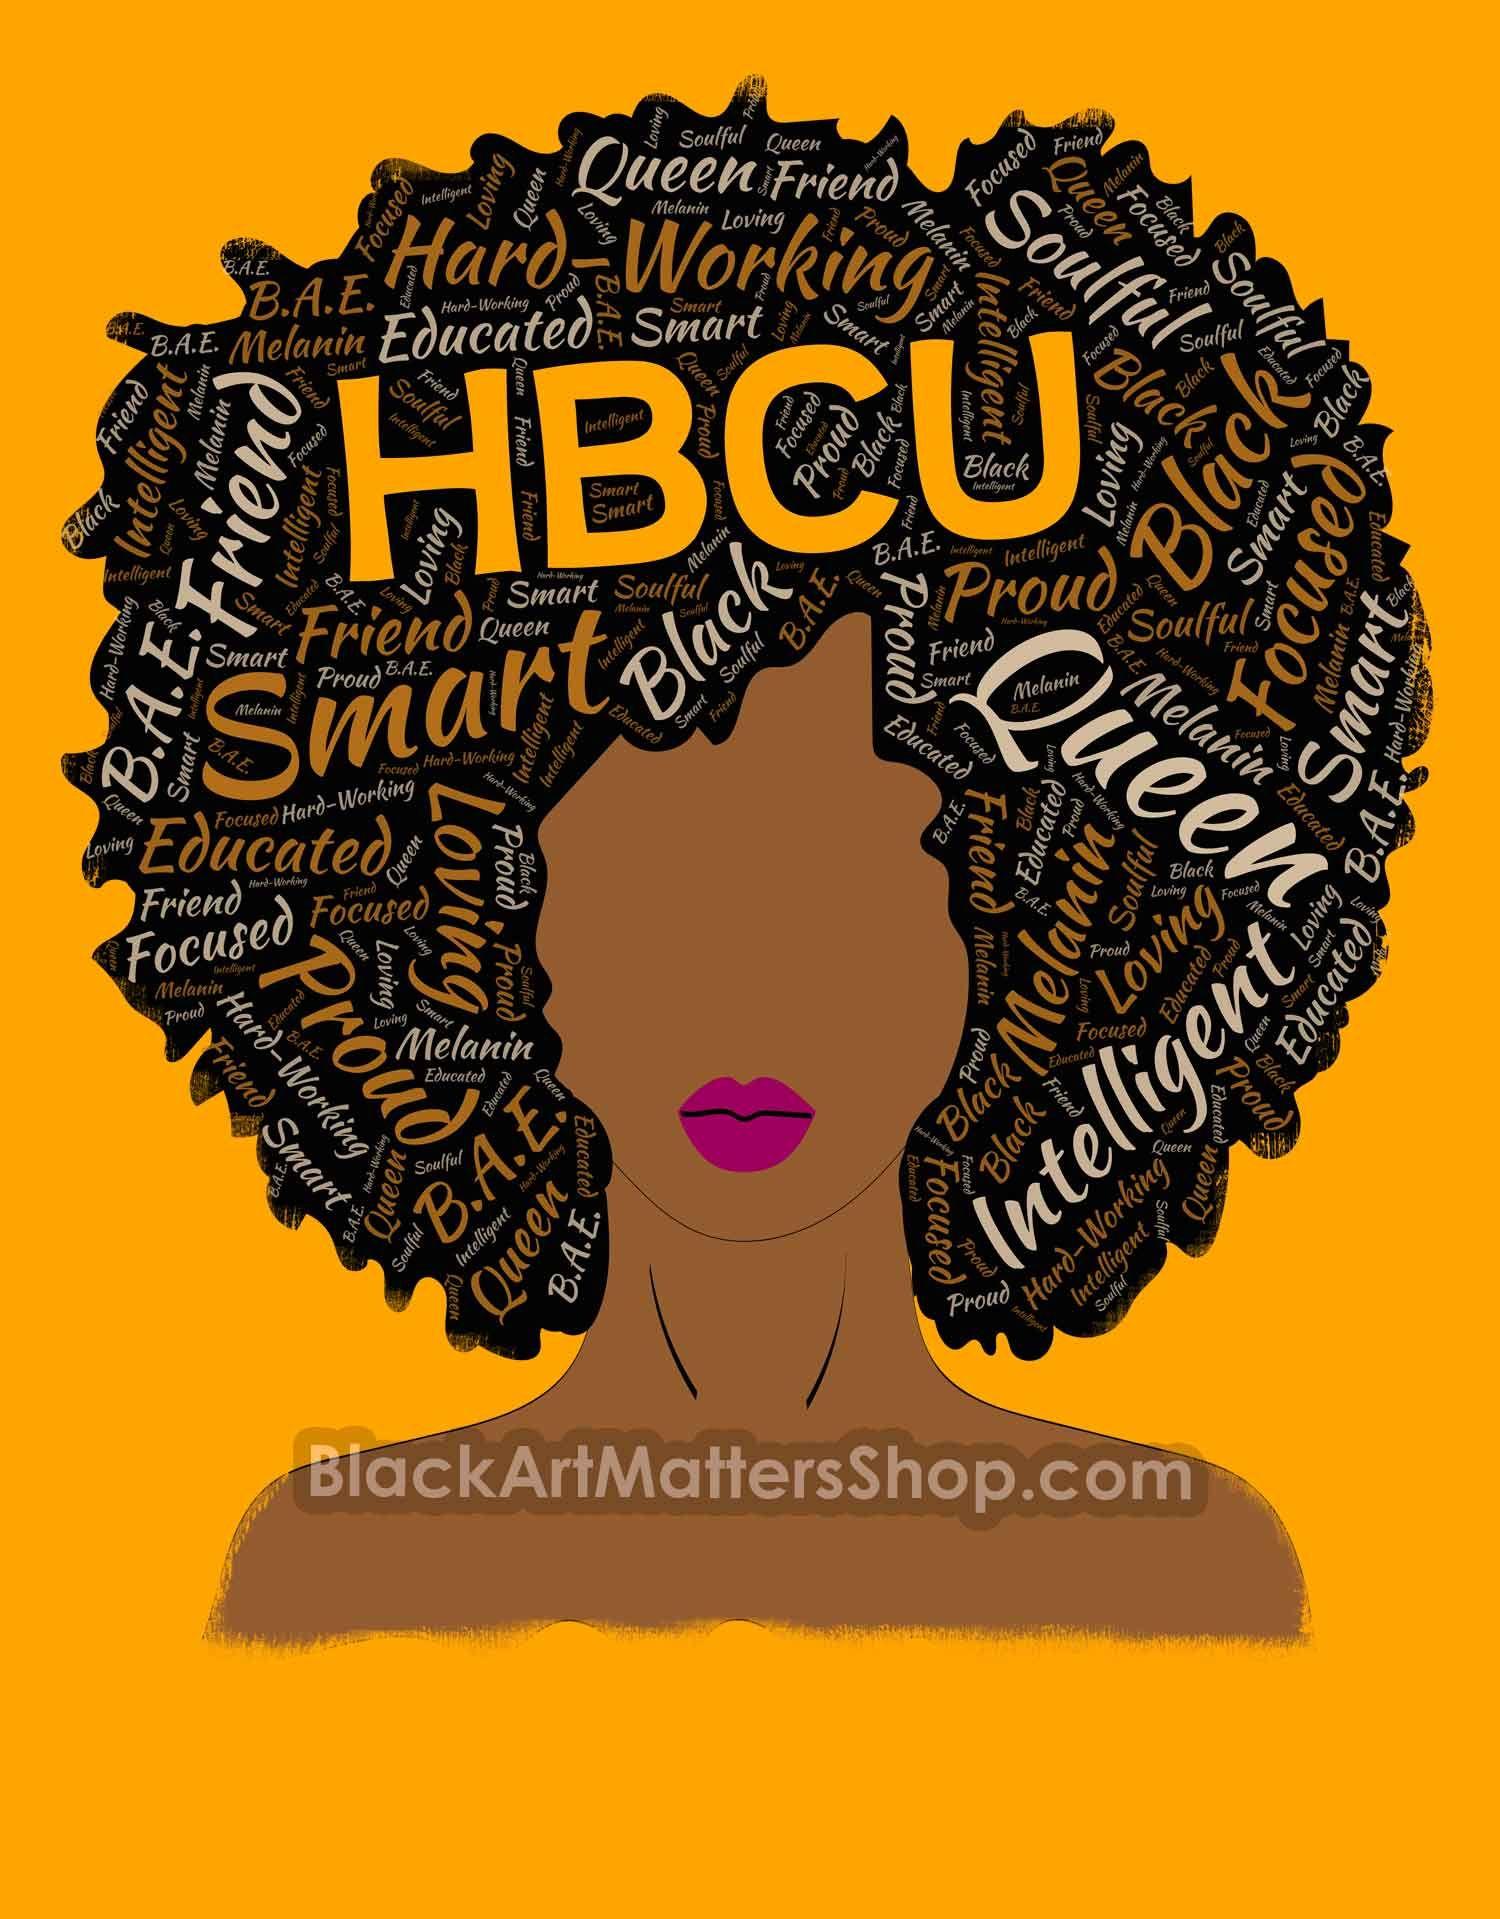 I AM BLACK HISTORY Youth T-Shirt Black History Month Melanin Magic Black Power African Afro American Africa Kids Boys Girls Gift Tee